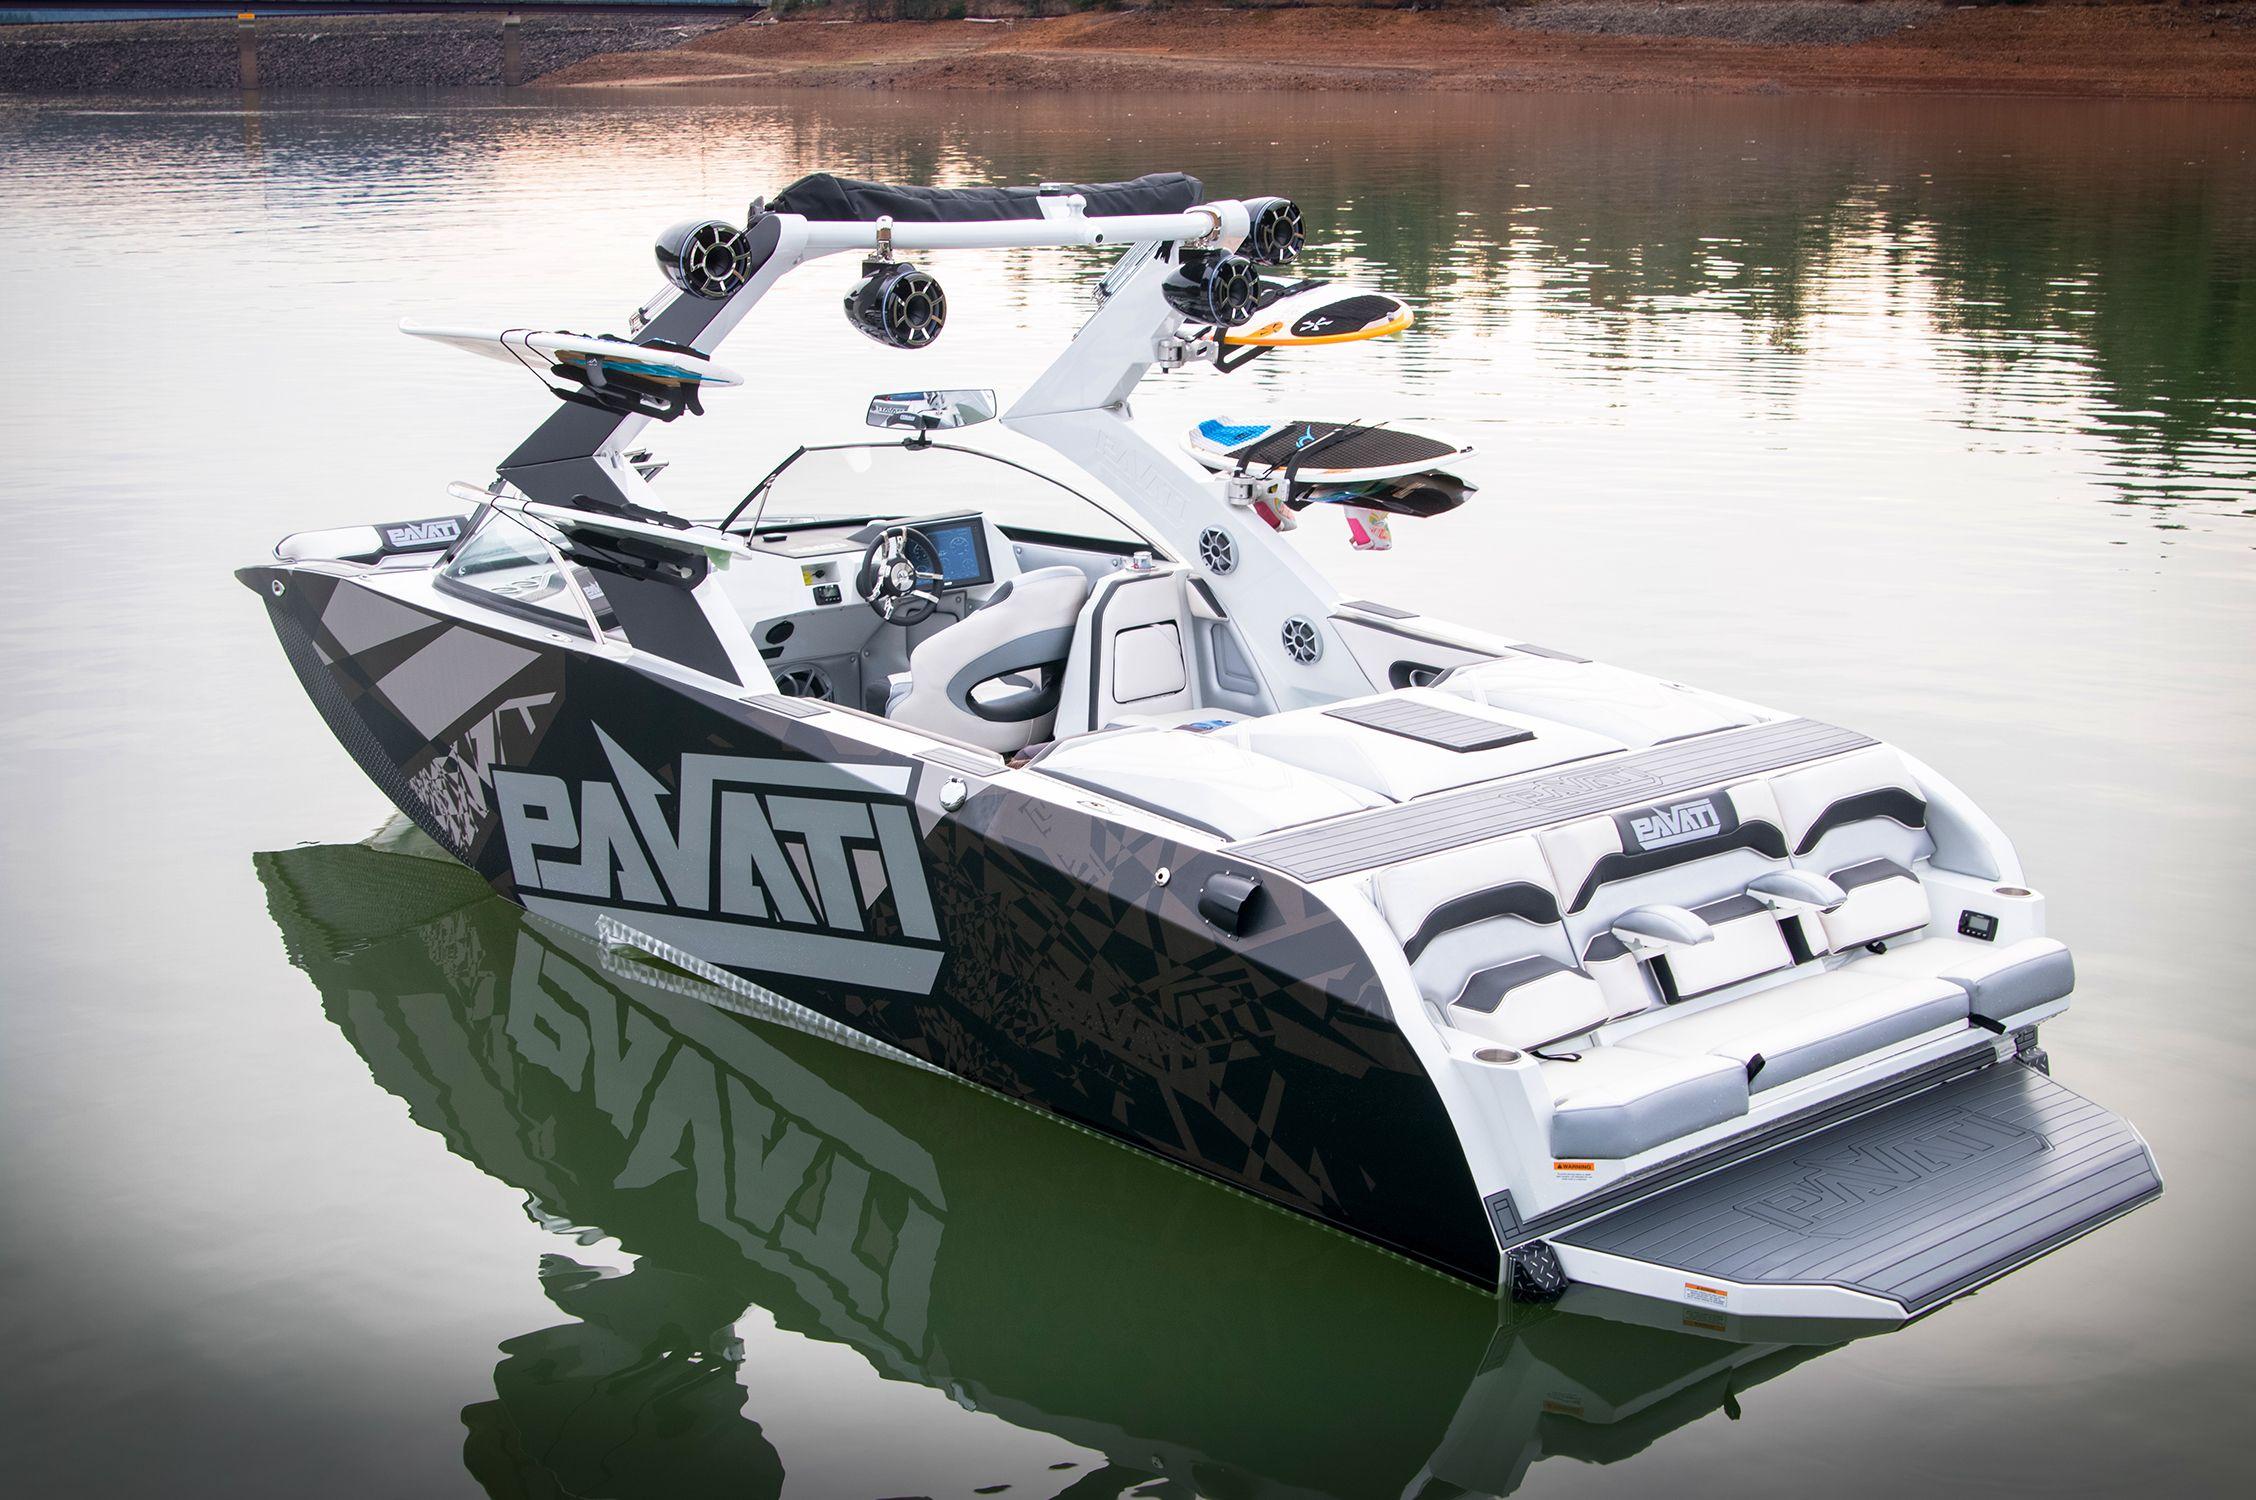 Boats For Sale Las Vegas >> 2015 Pavati AL-24s Wake Boat w/ Silver Lightning wrap. | 2015 Pavati AL-24s Silver Lightning ...